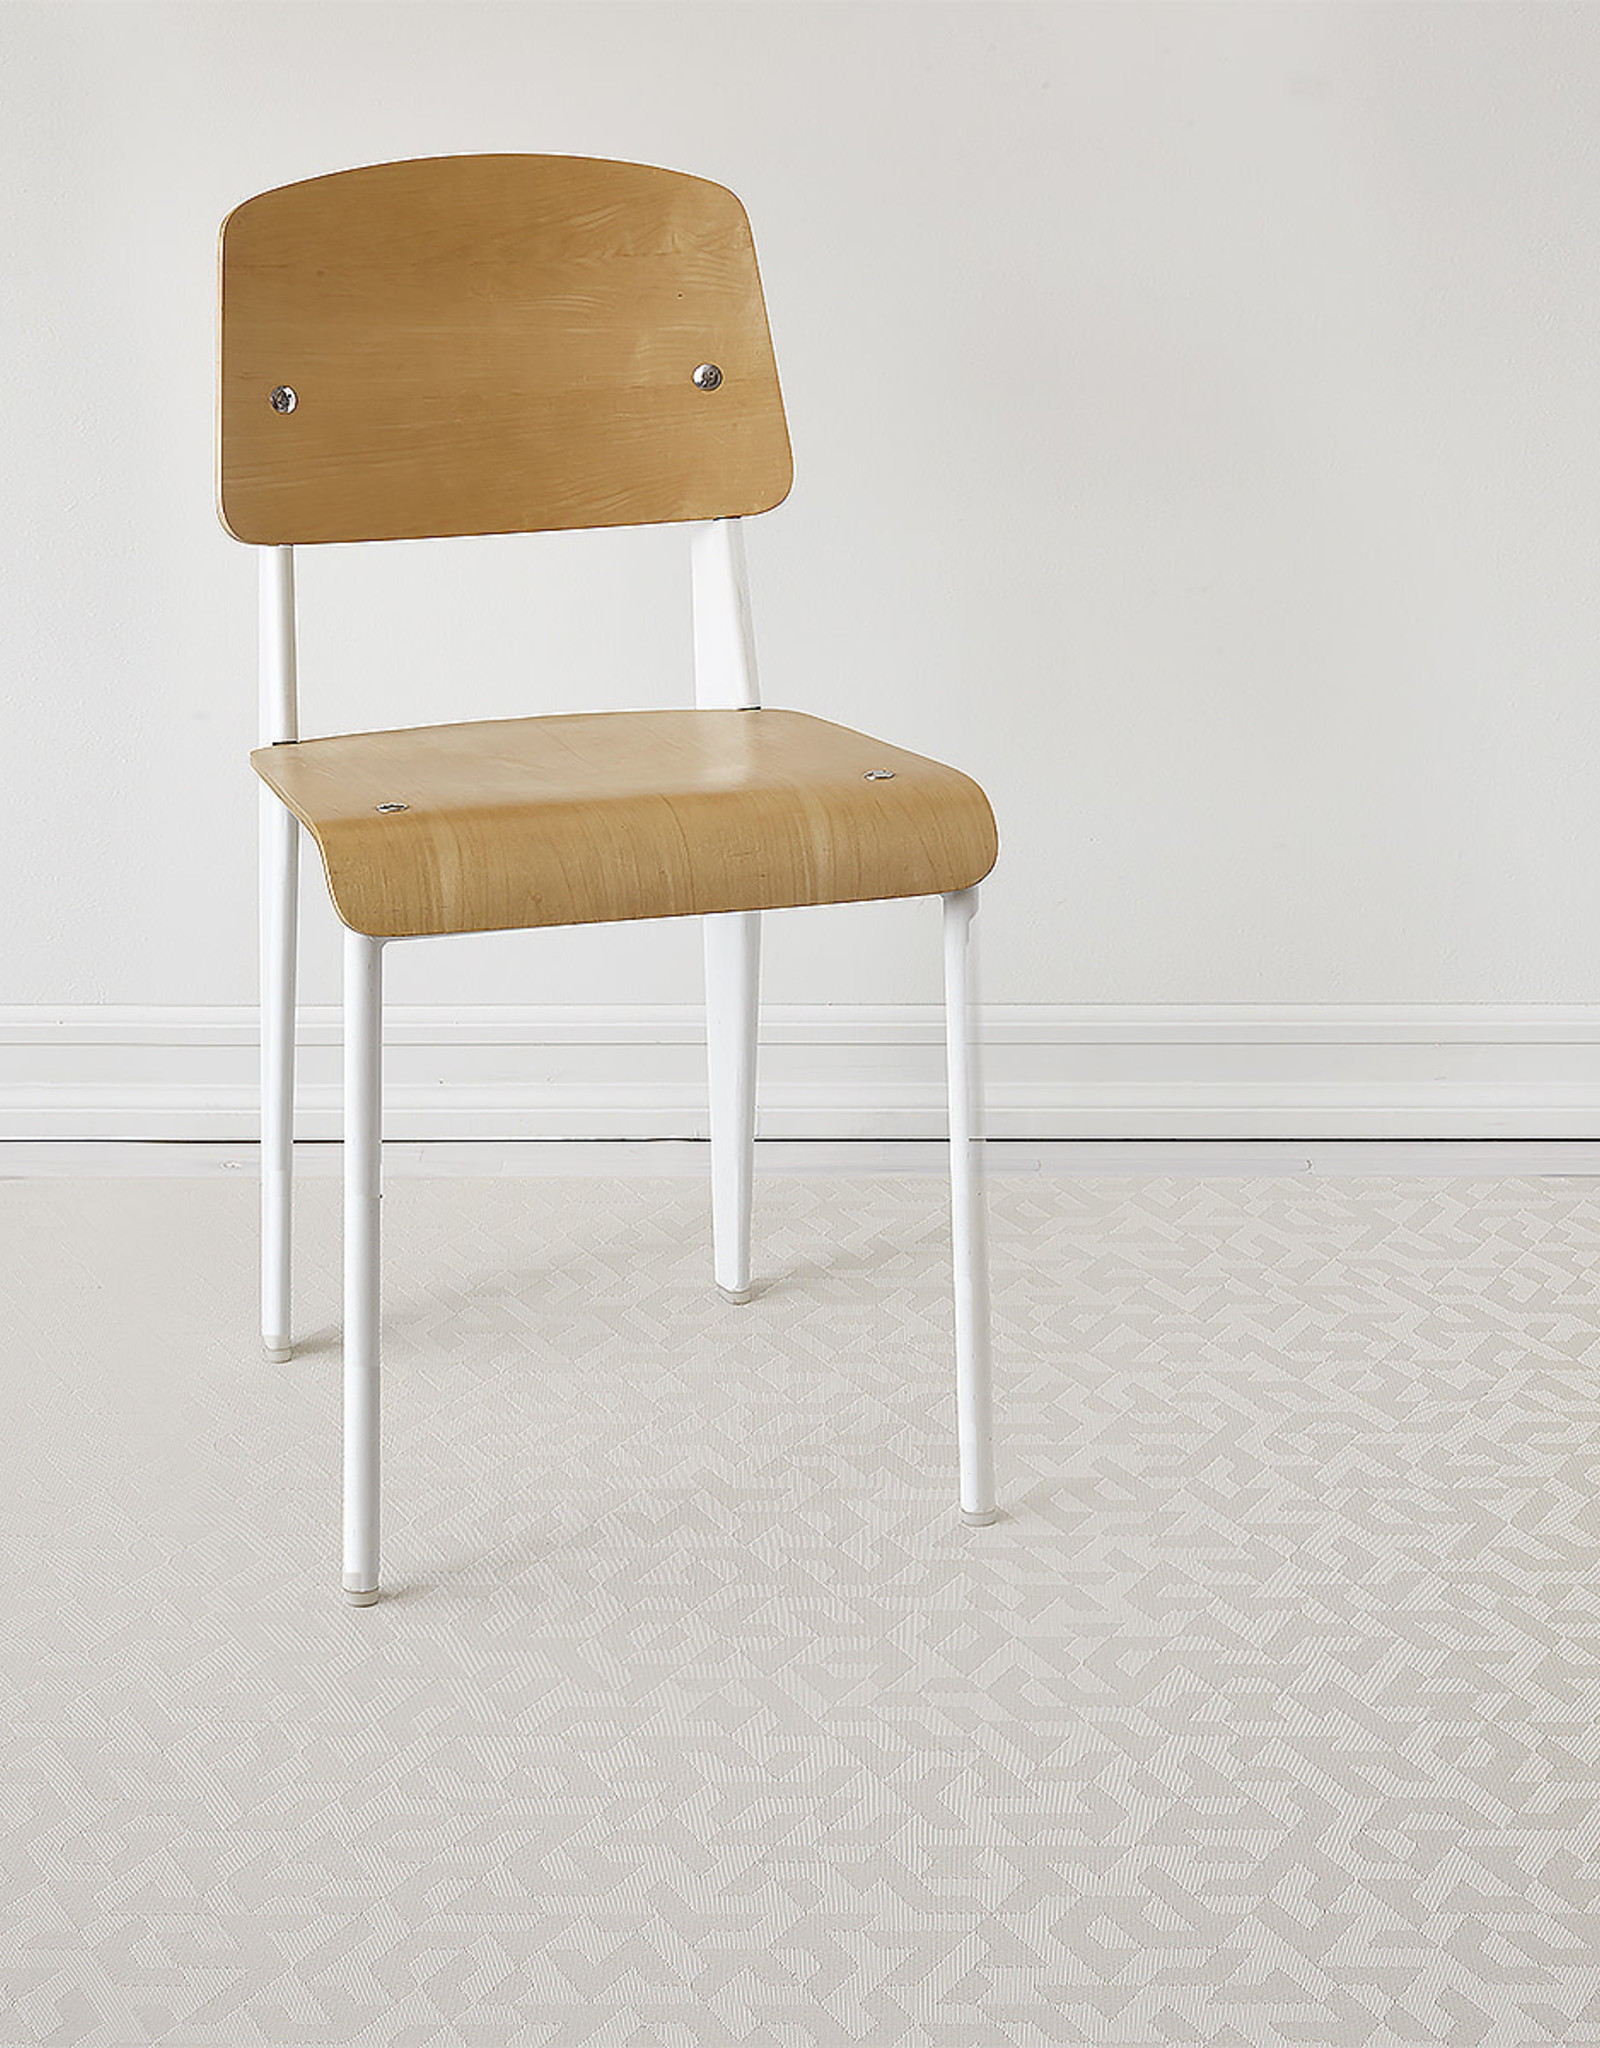 Chilewich Prism Floormat 35 x 48, NATURAL